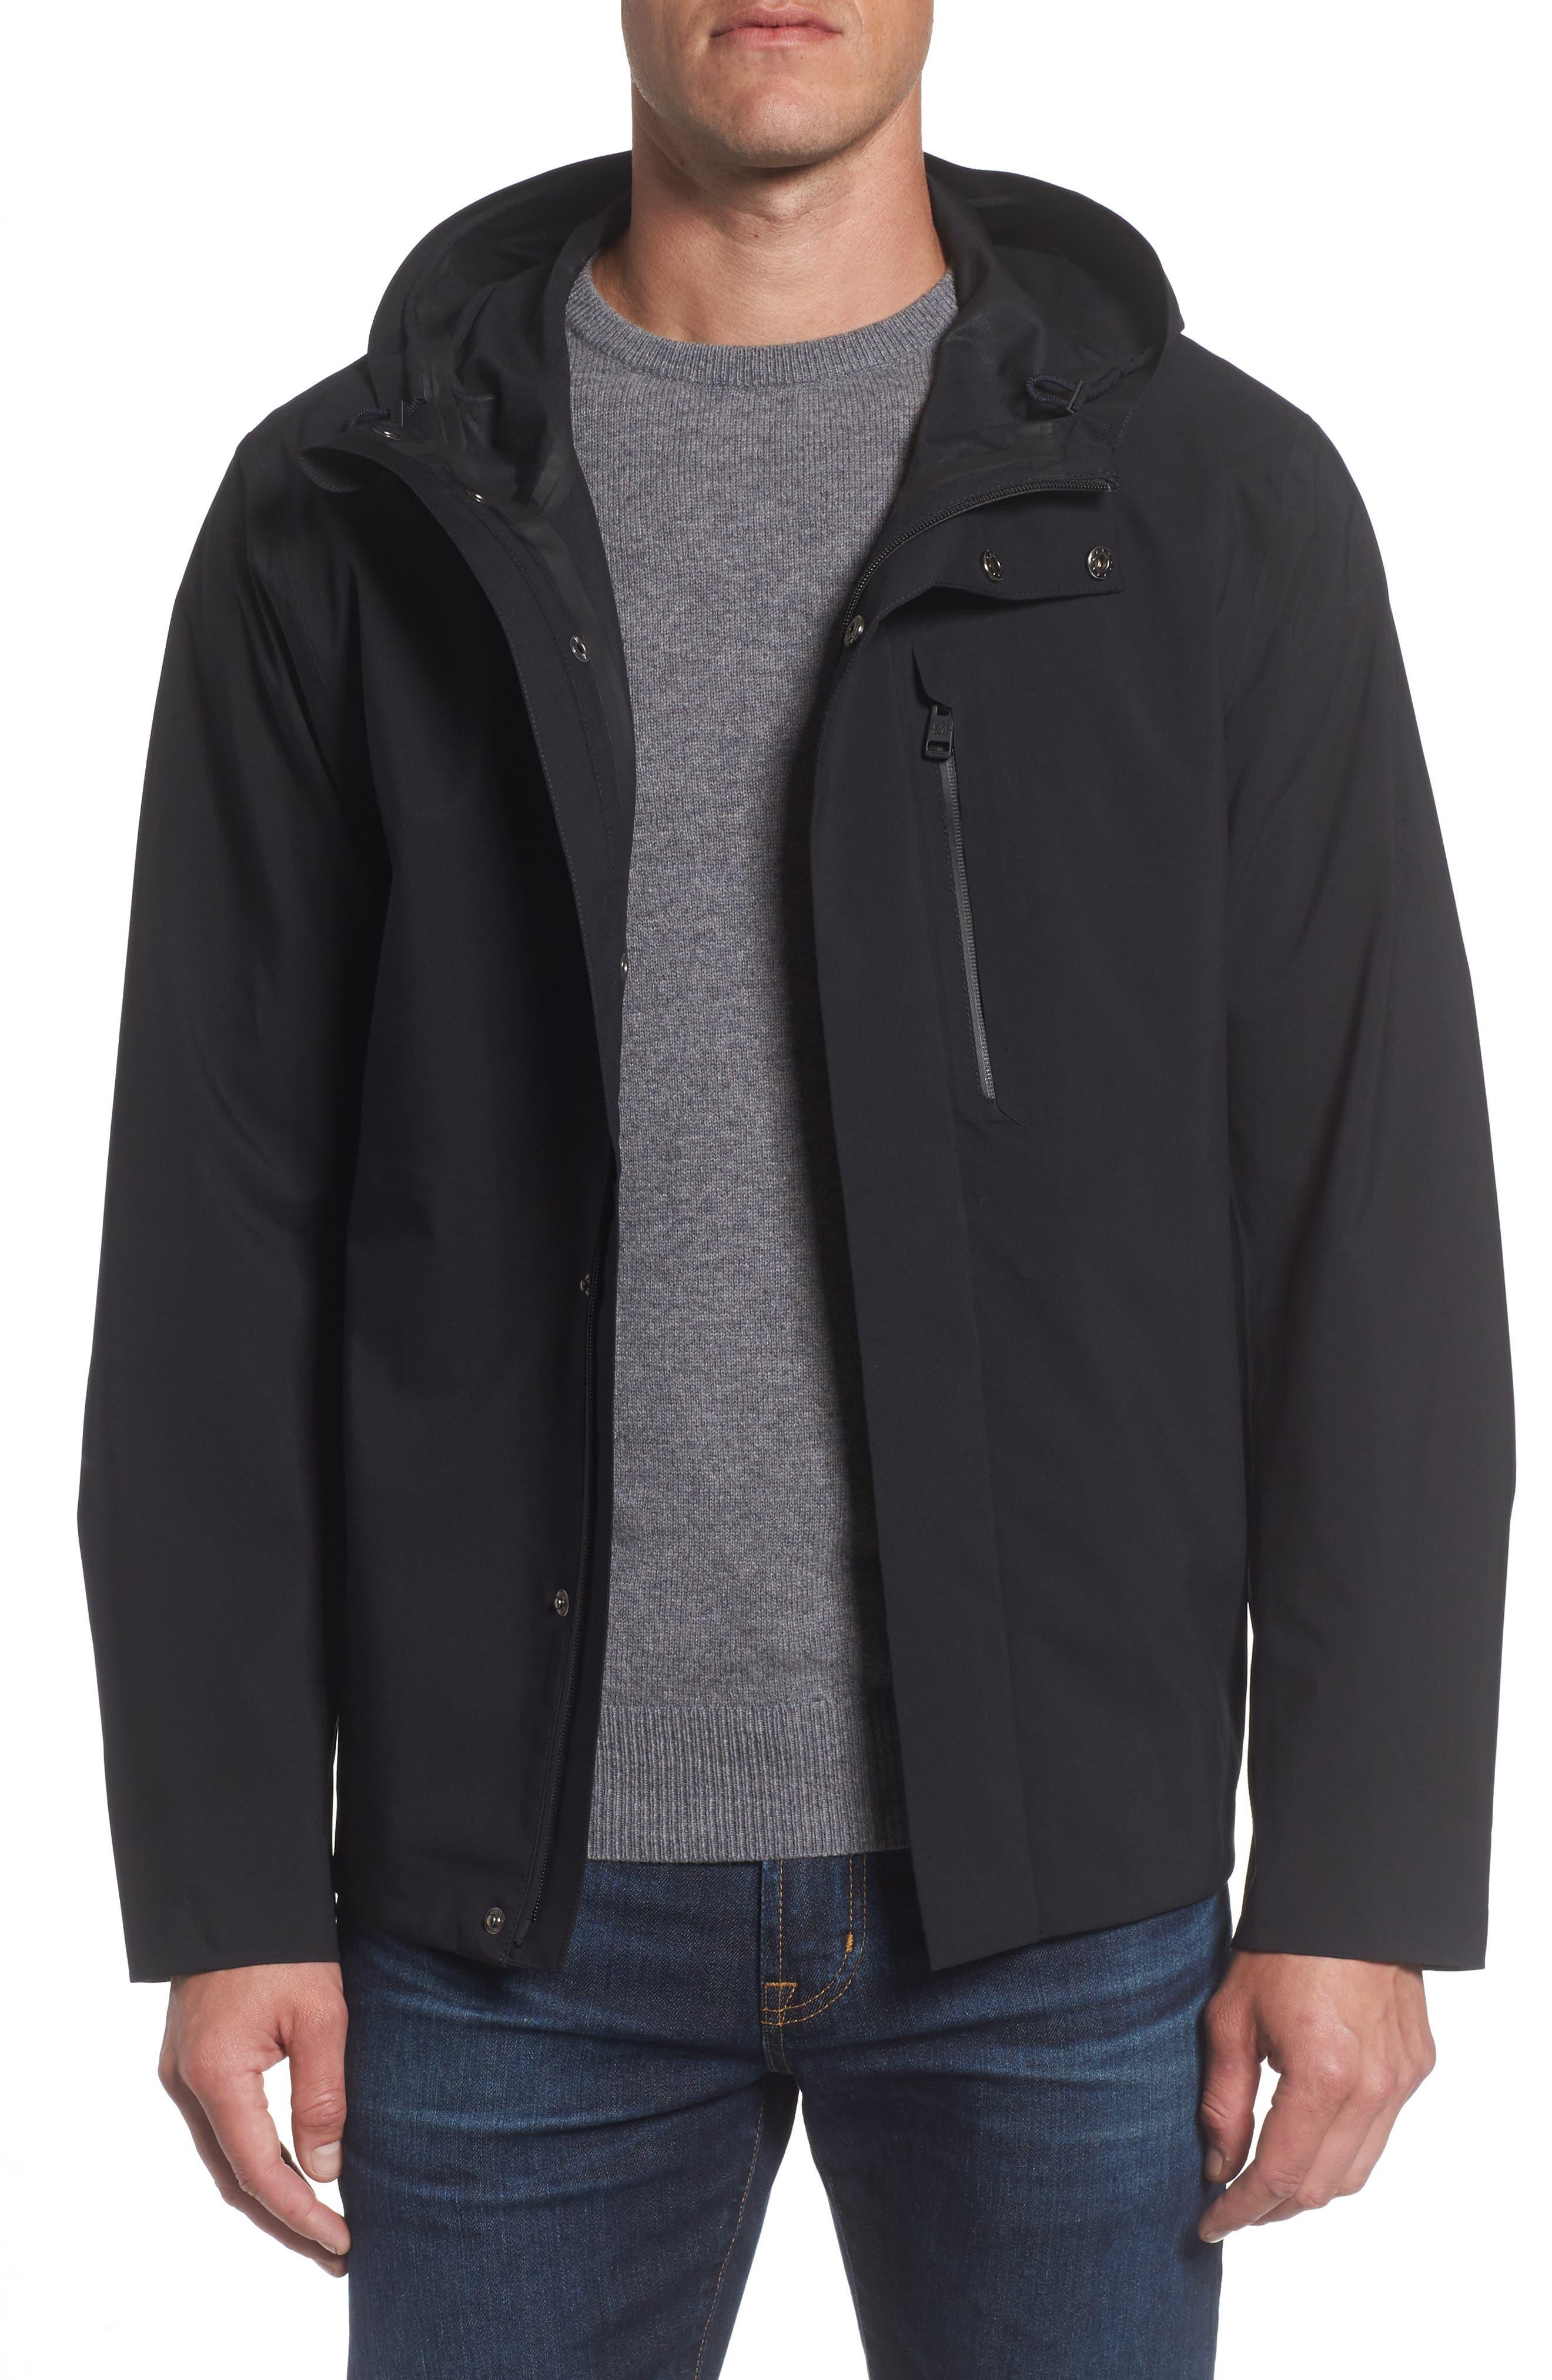 Marc New York Stratus Waterproof Hooded Rain Jacket,                             Main thumbnail 1, color,                             001